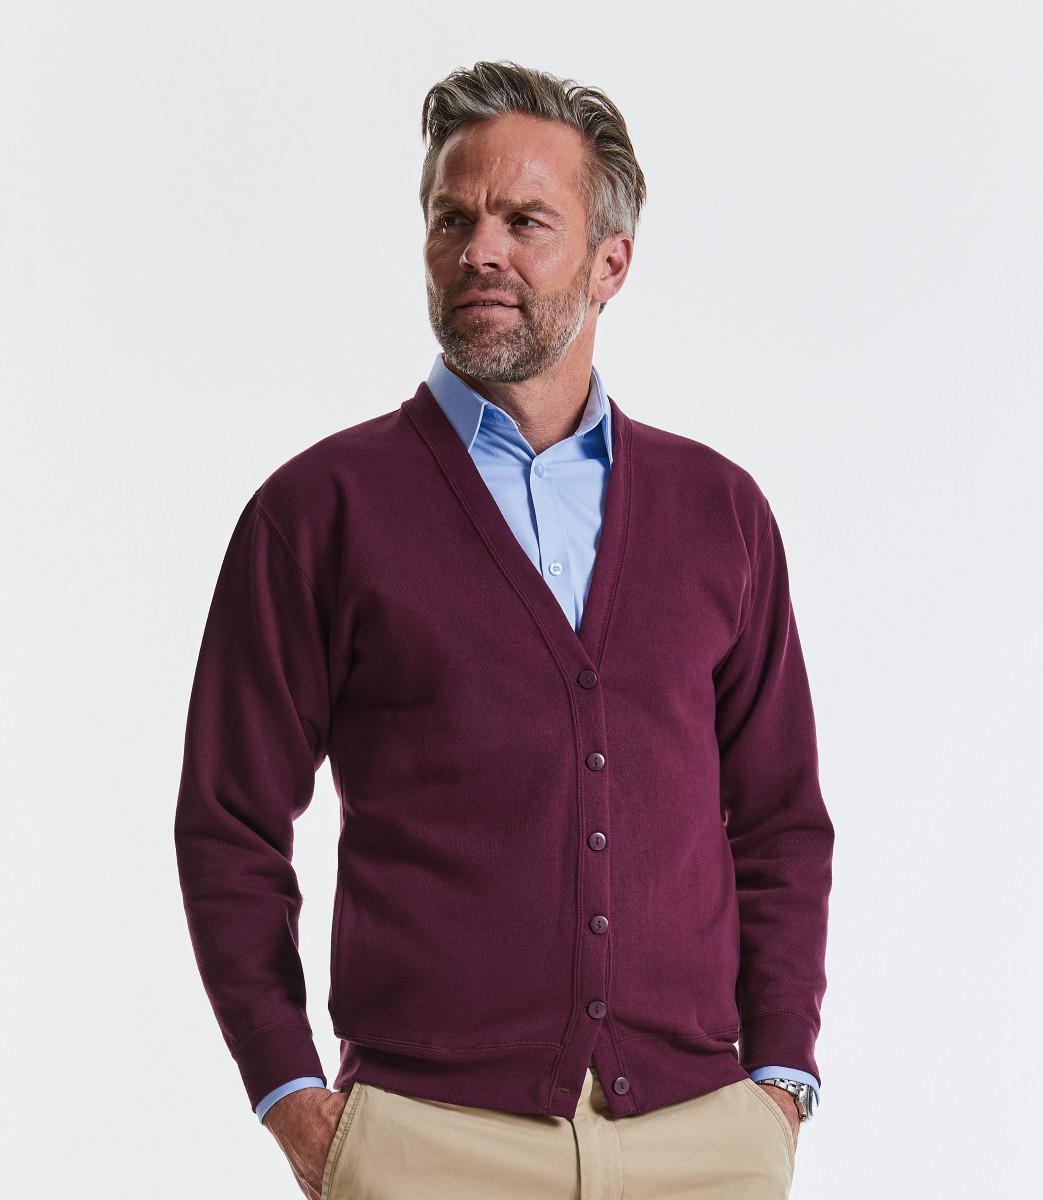 Sweatshirt Cardigan - 1